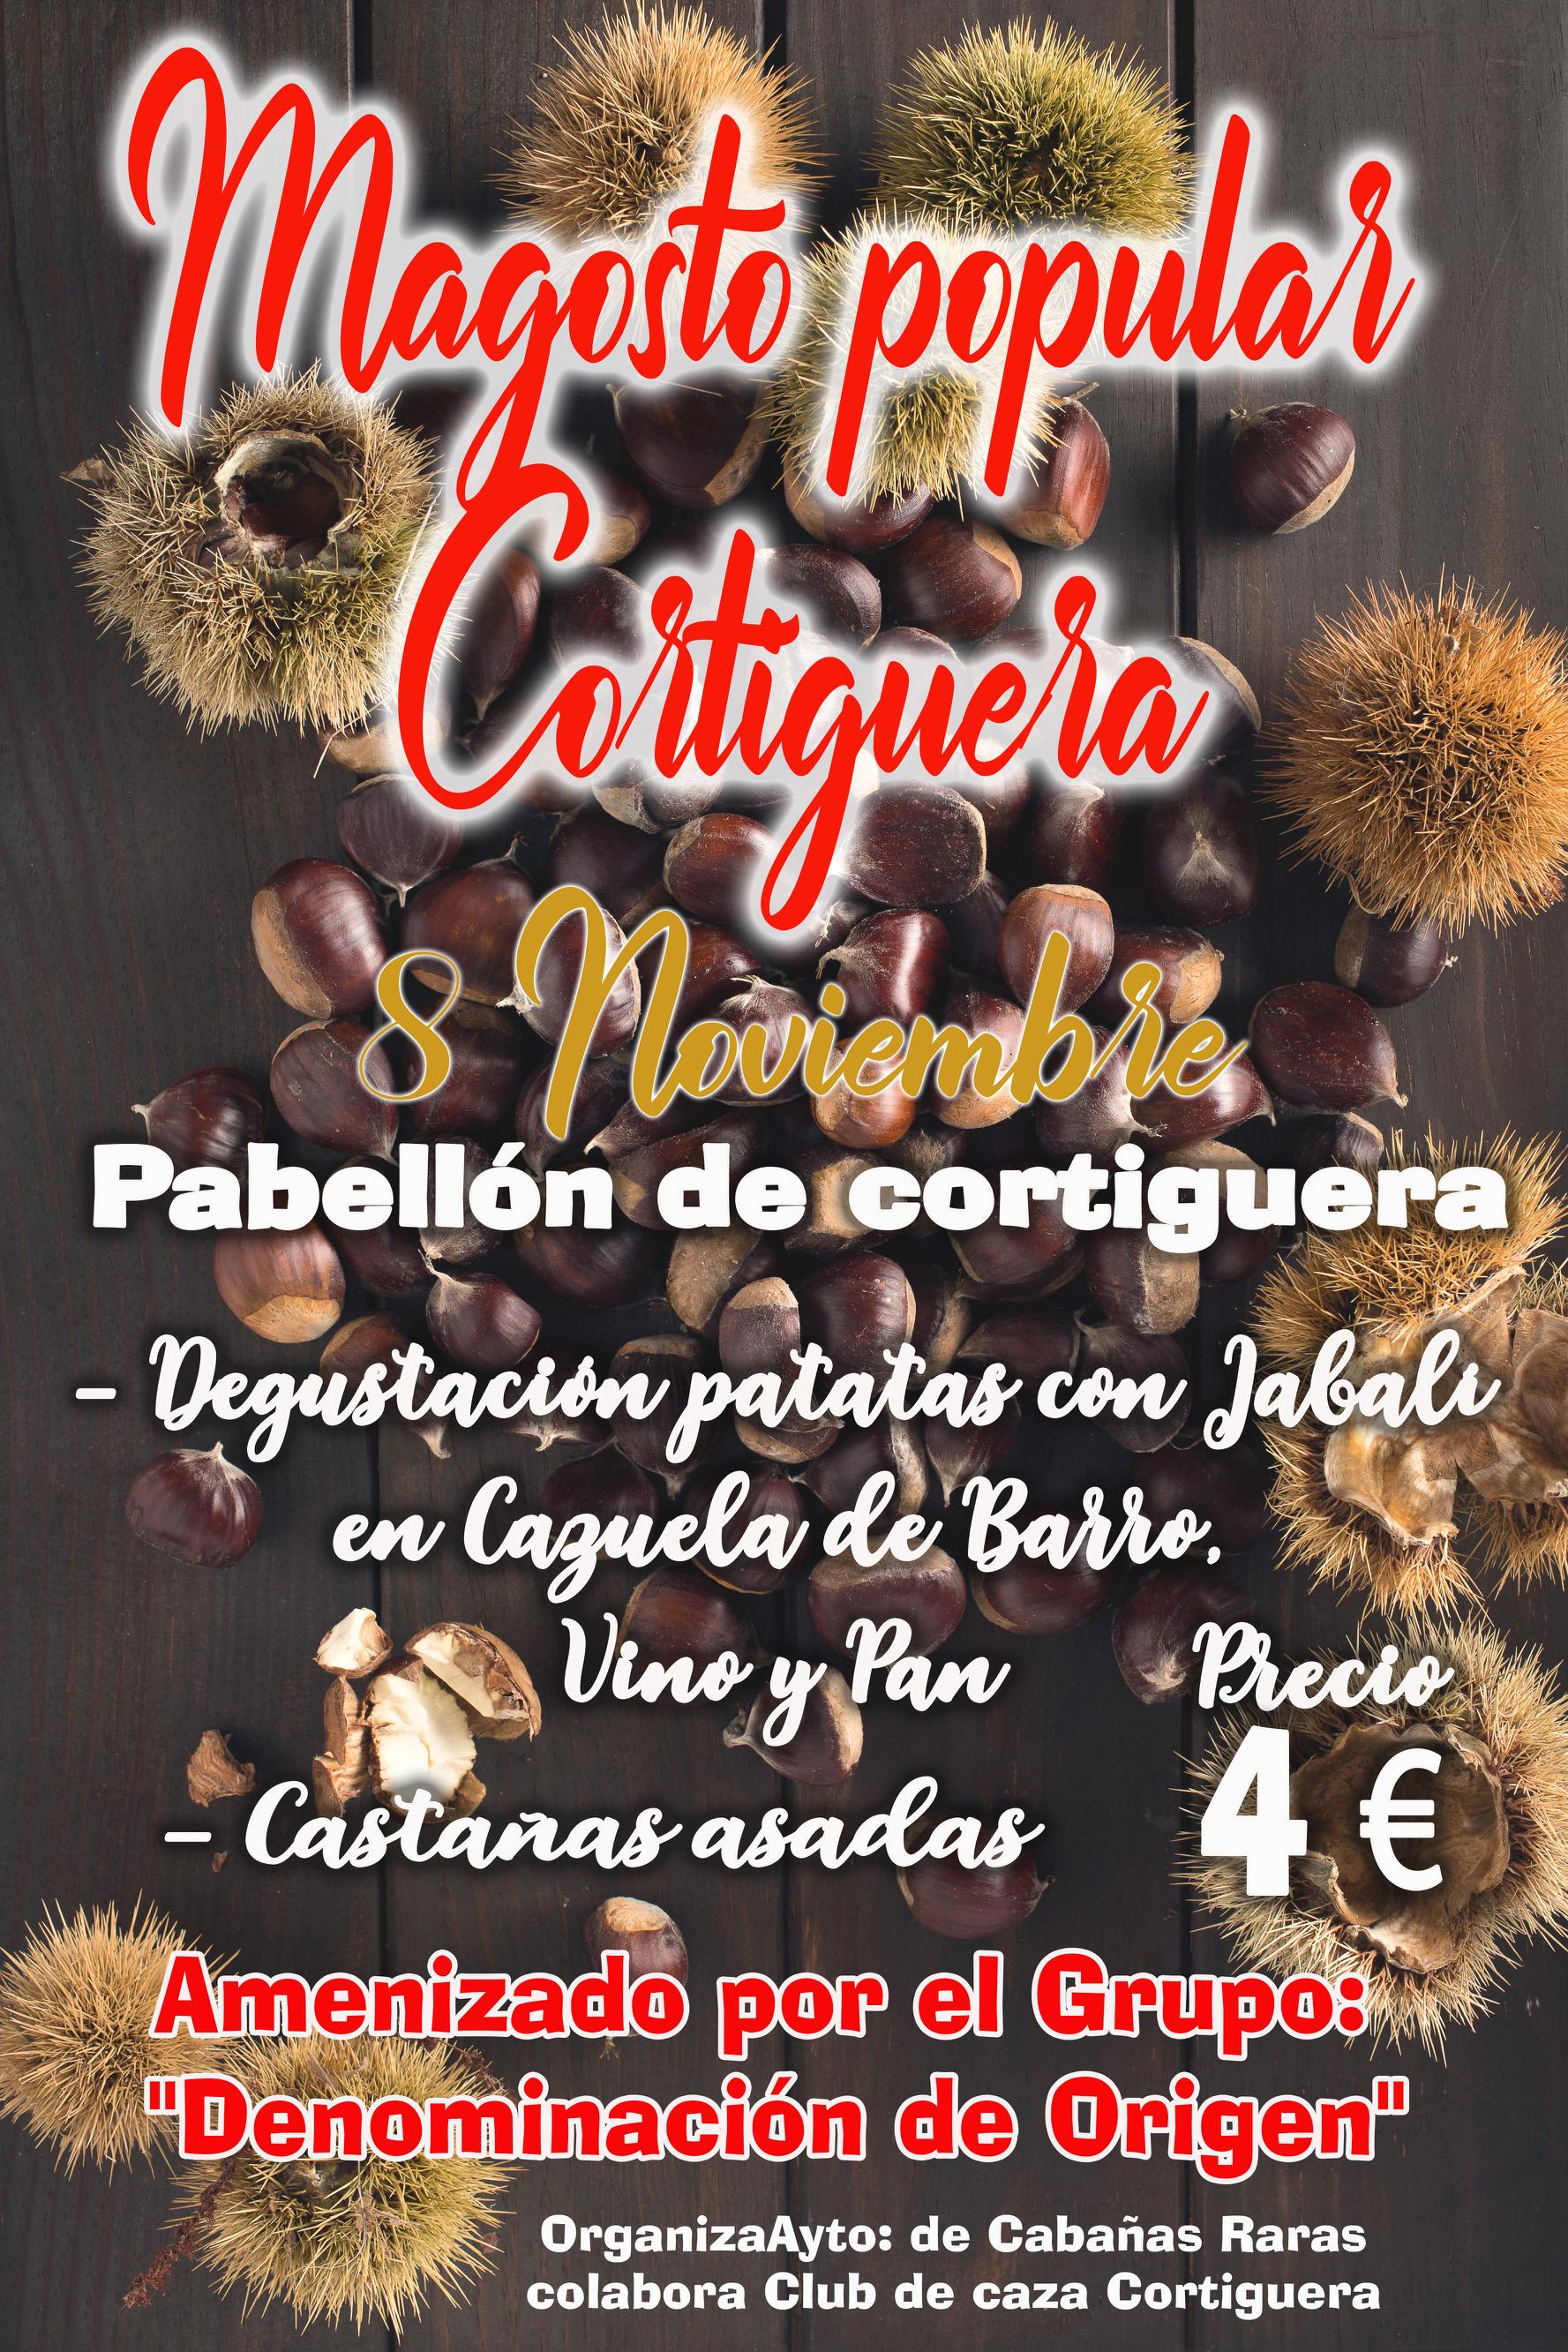 Gran Magosto popular en Cortiguera. 8 de noviembre 2019 1